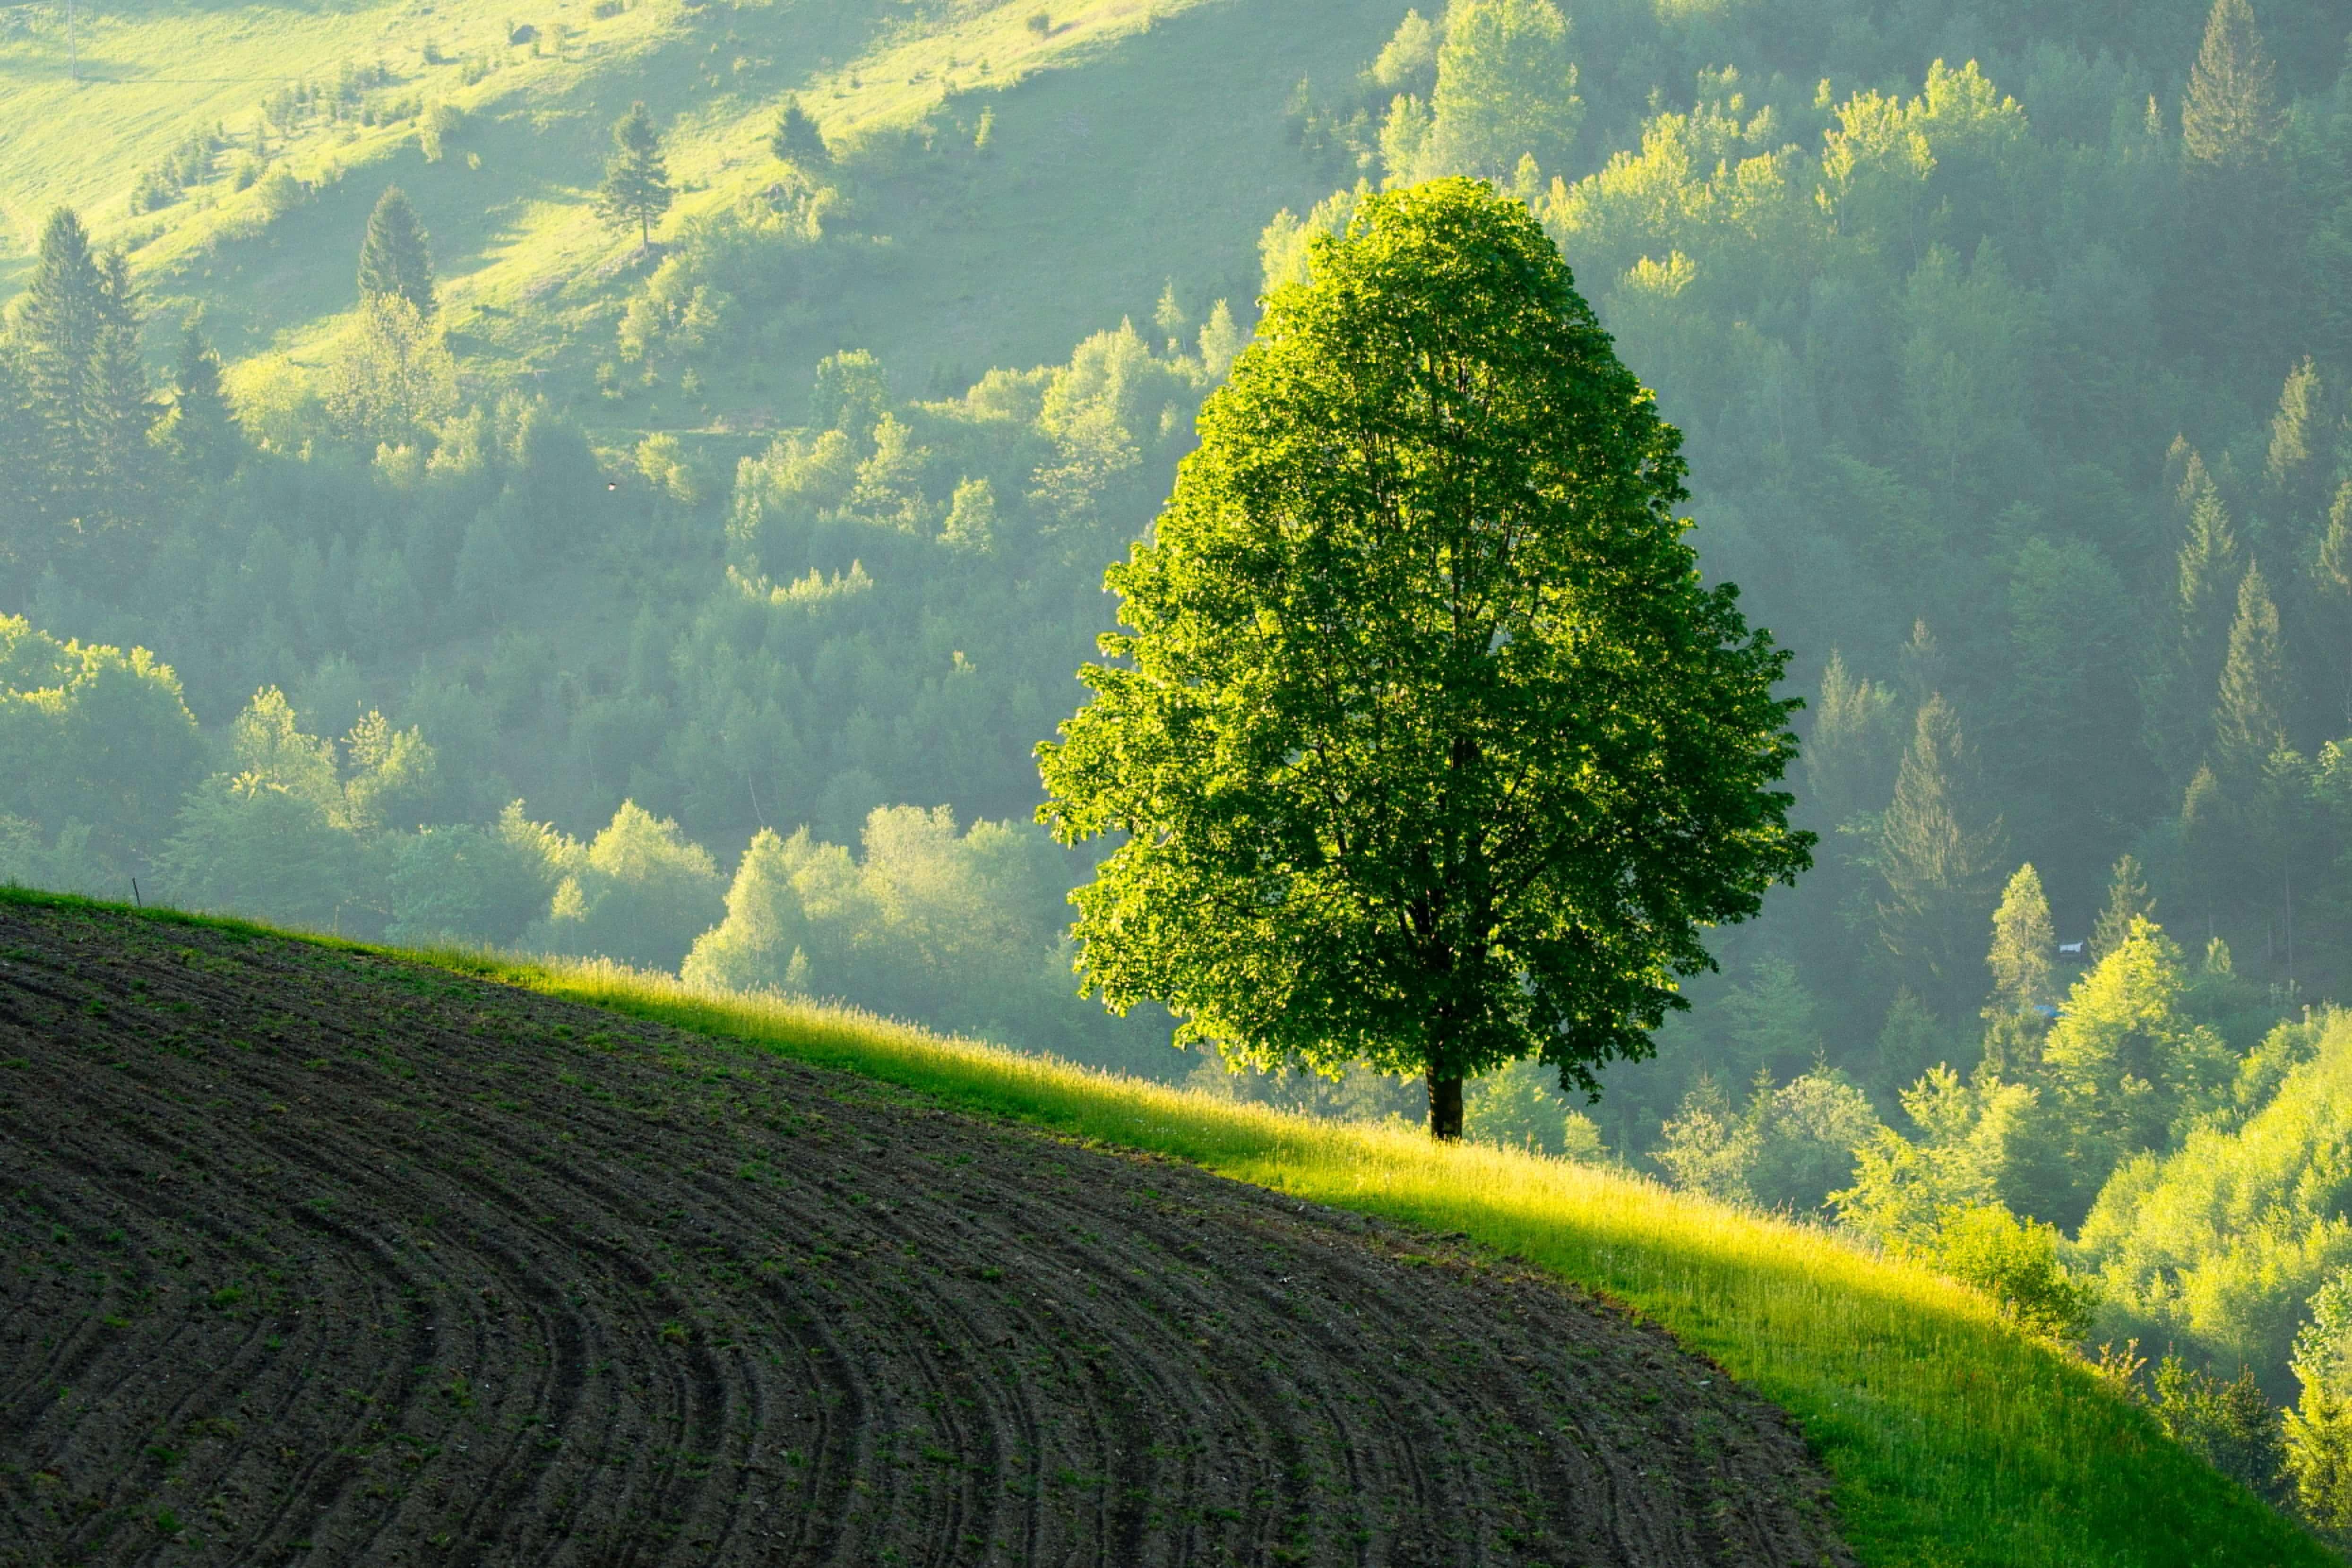 Linden Tree_Slovenia_Janez Tolar, www.slovenia.info